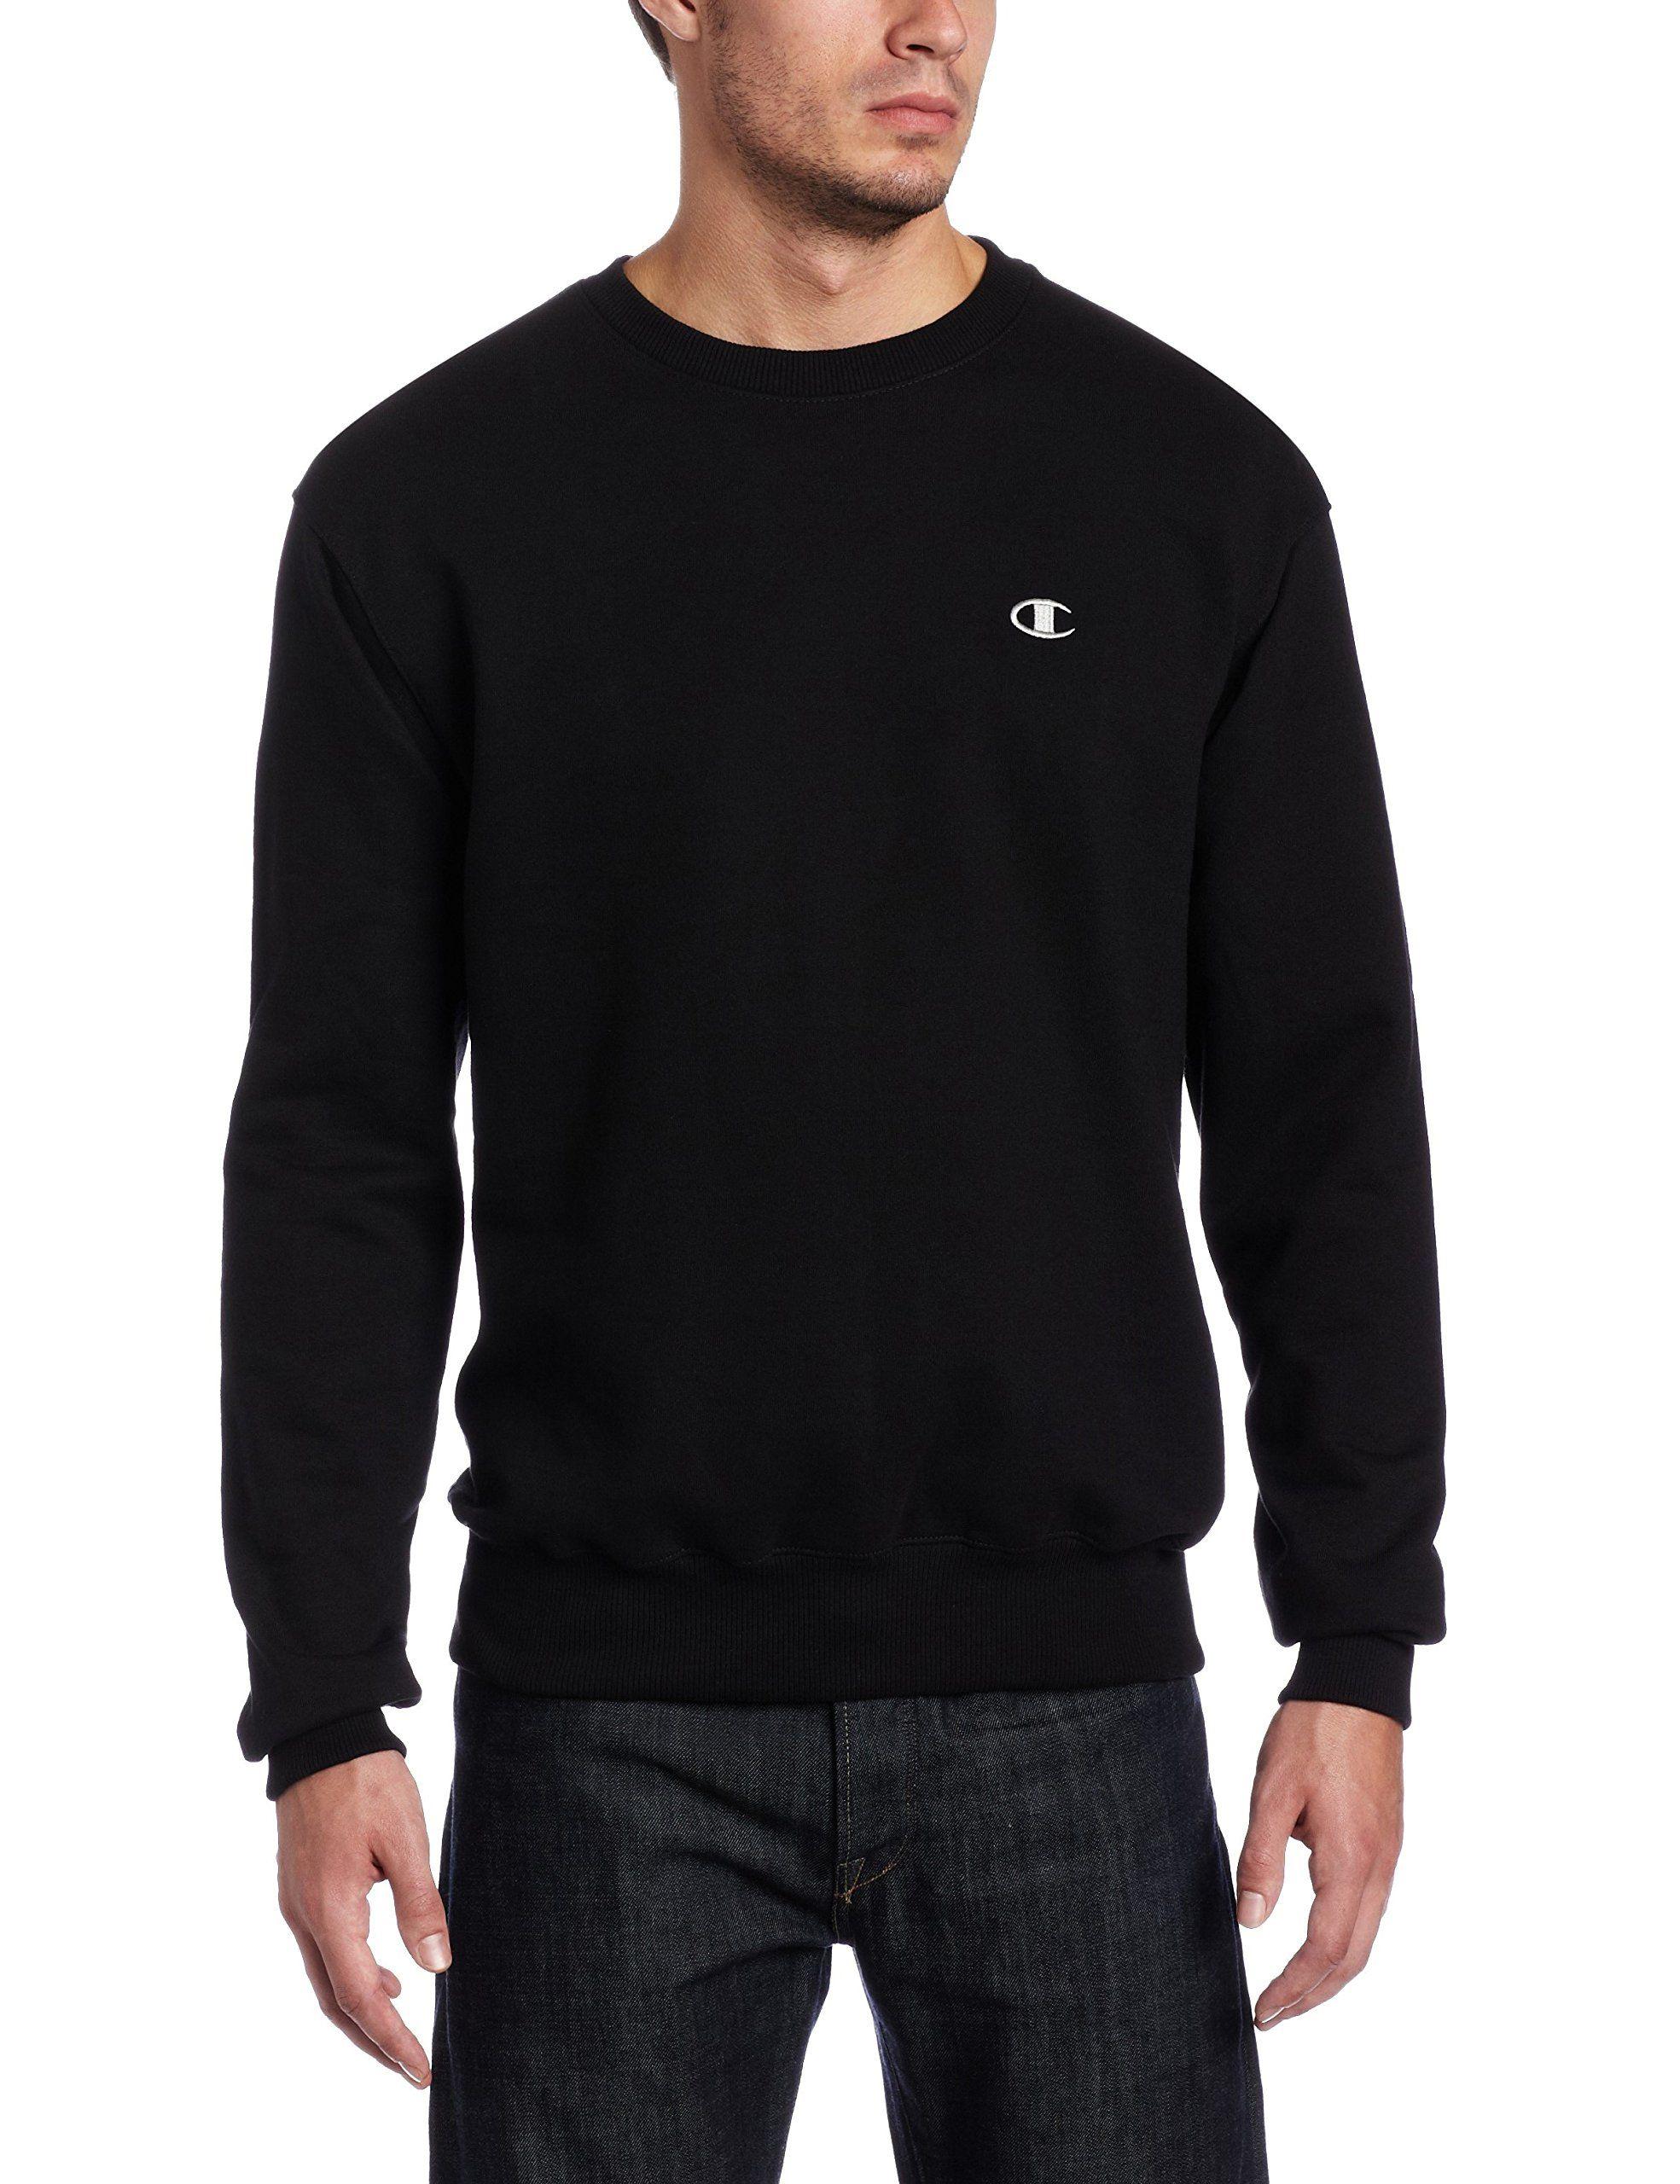 6274c04f9 Champion Sweatshirt Amazon – DACC